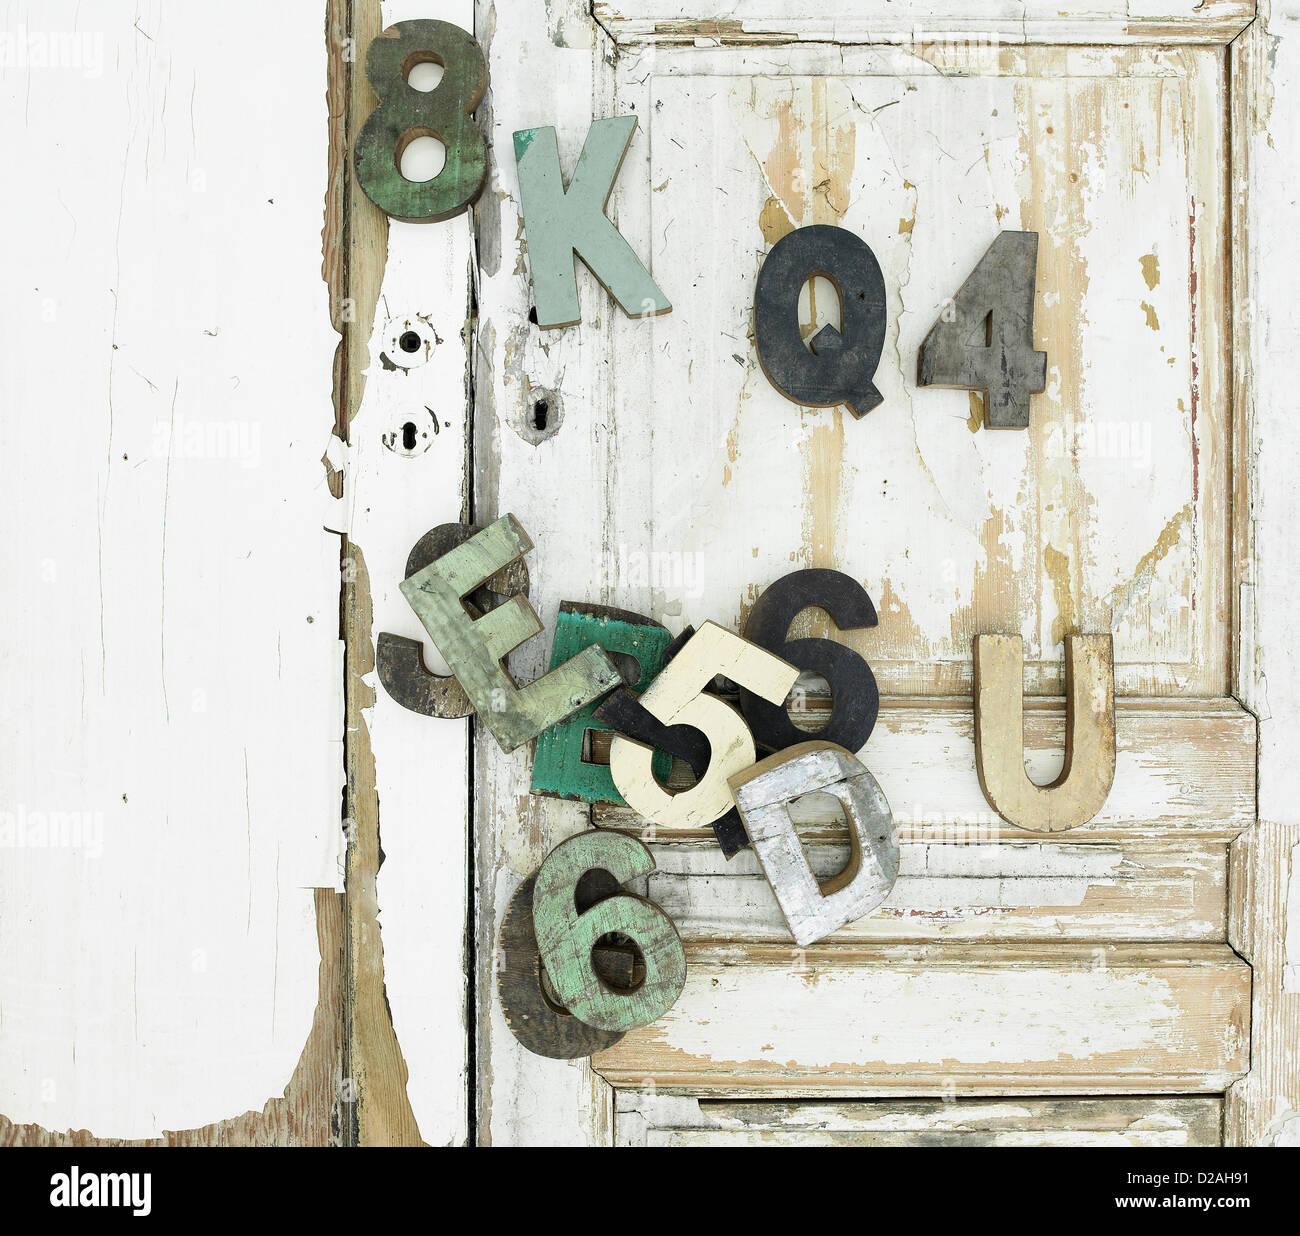 Decorative wooden symbols on door - Stock Image